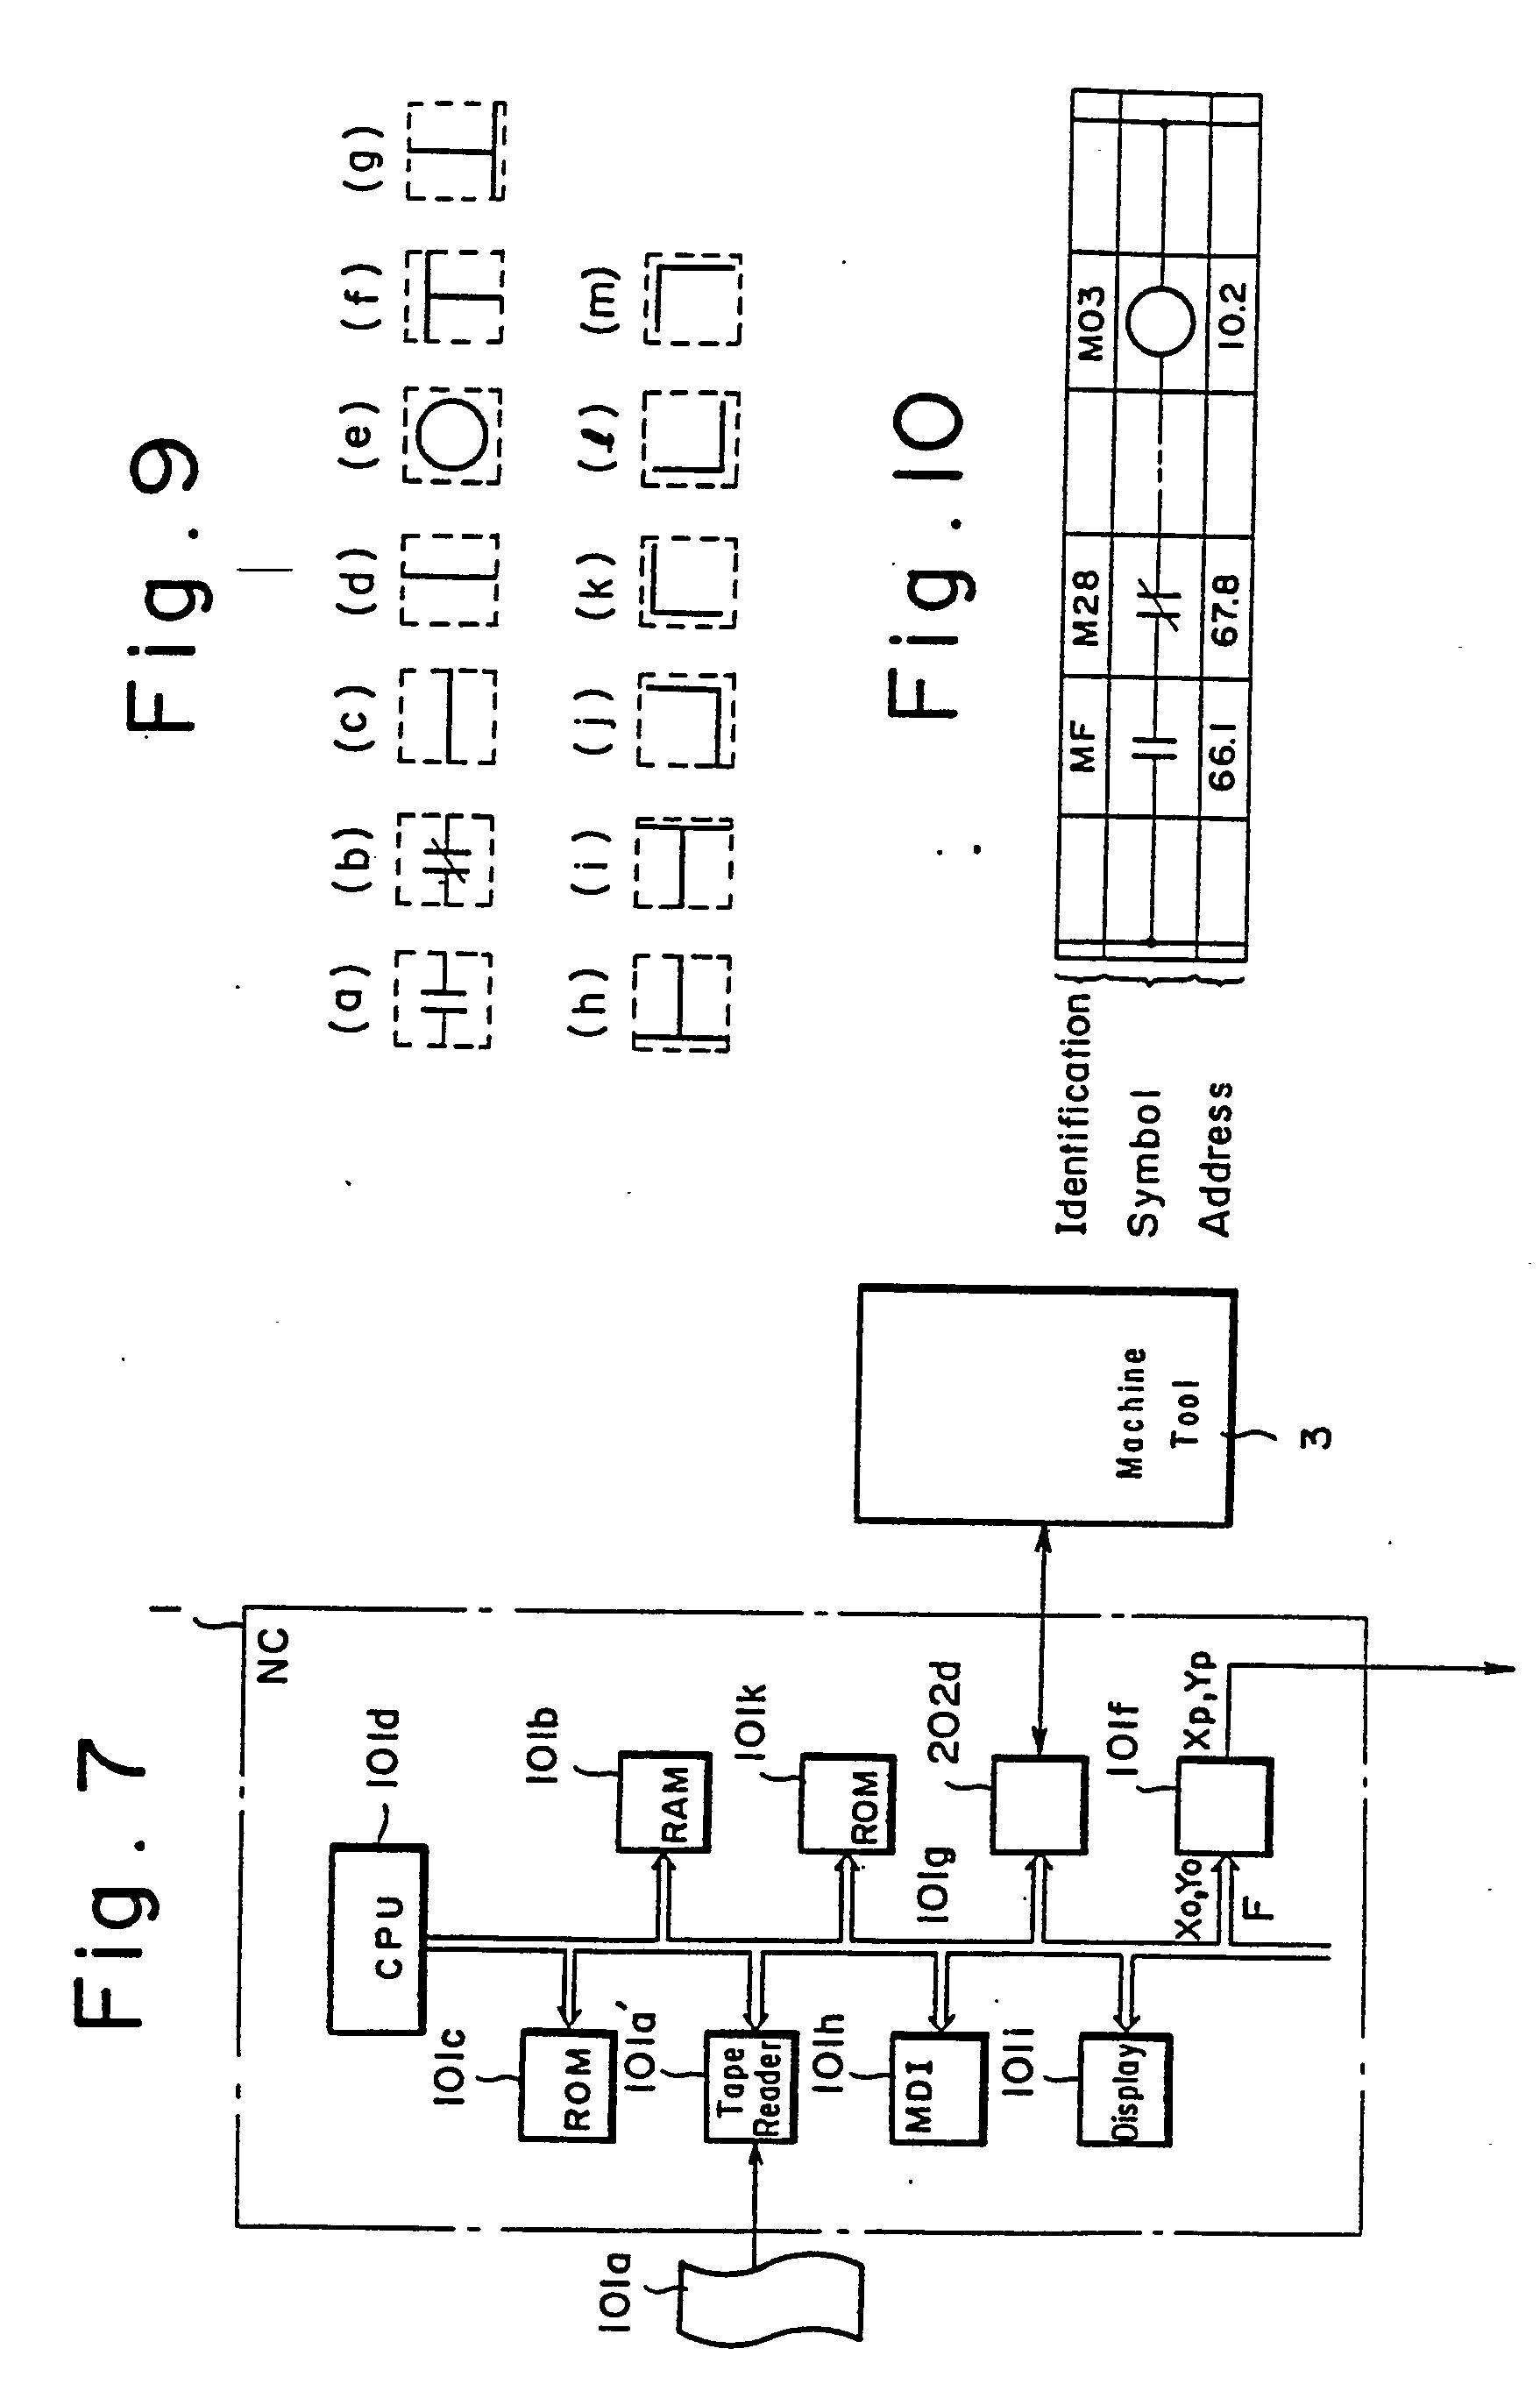 patent us5285376 fuzzy logic ladder diagram program for a